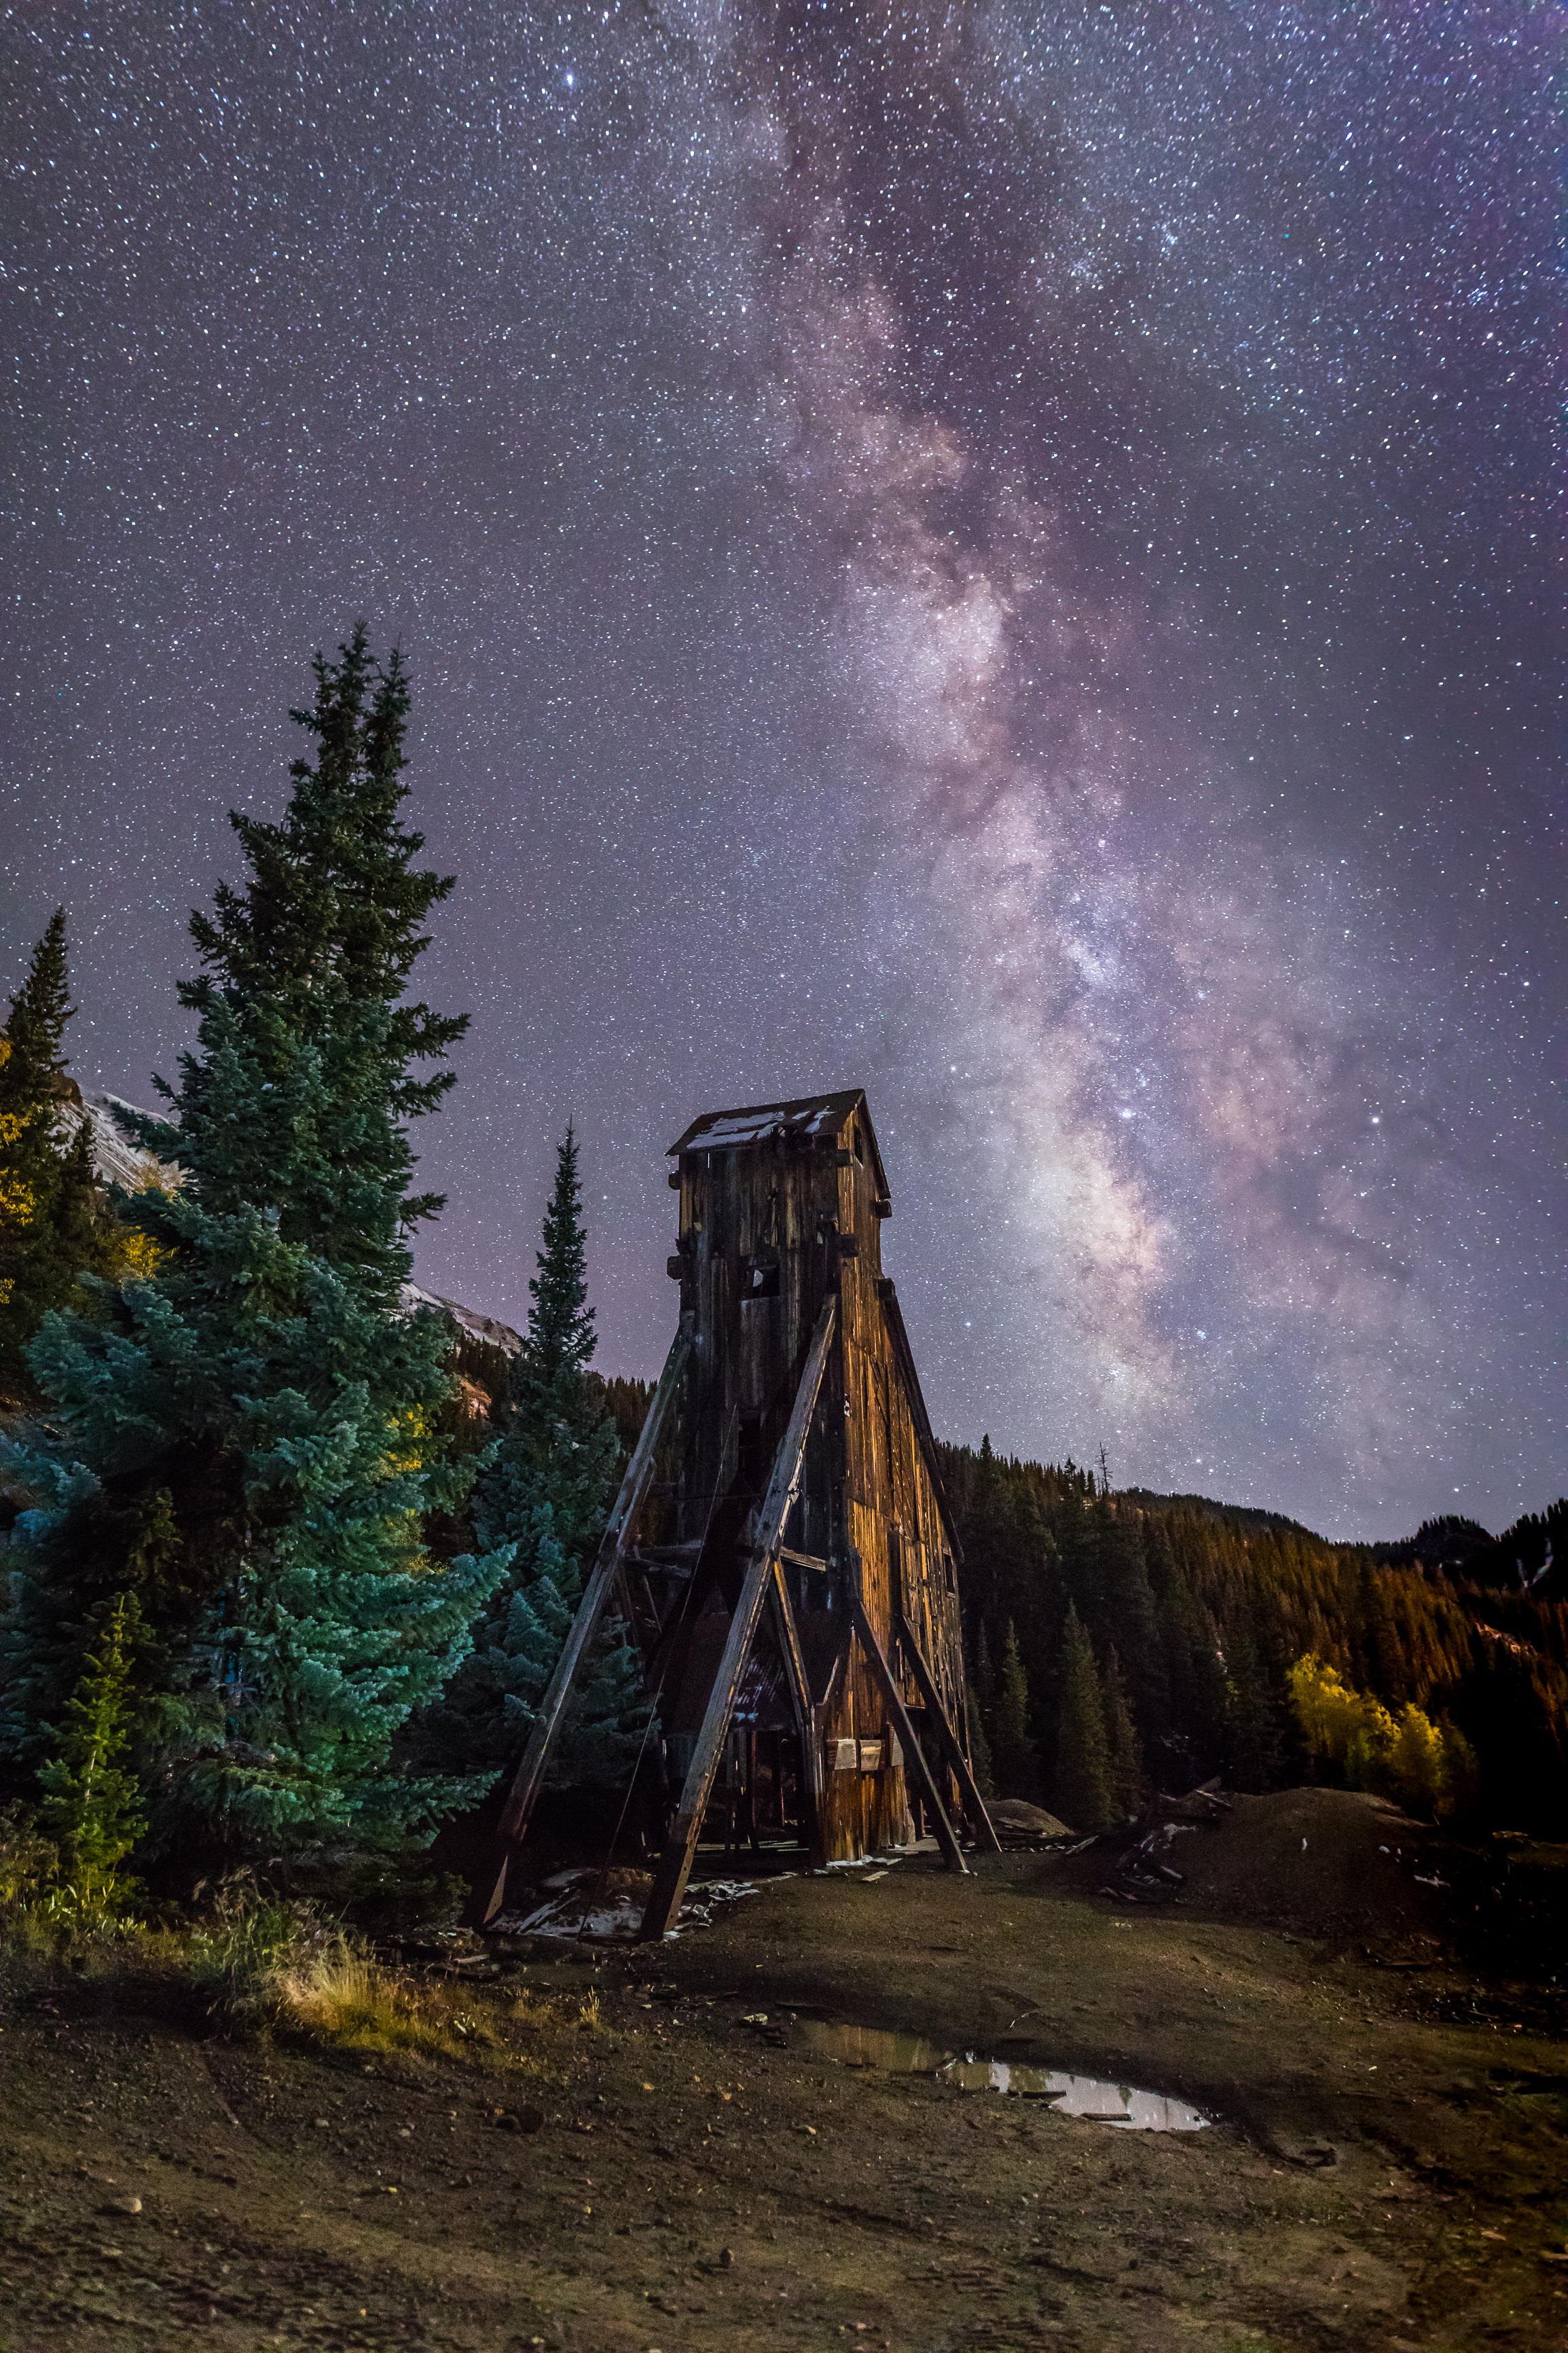 Milky way over Yankee Girl Mine, Image # 5453